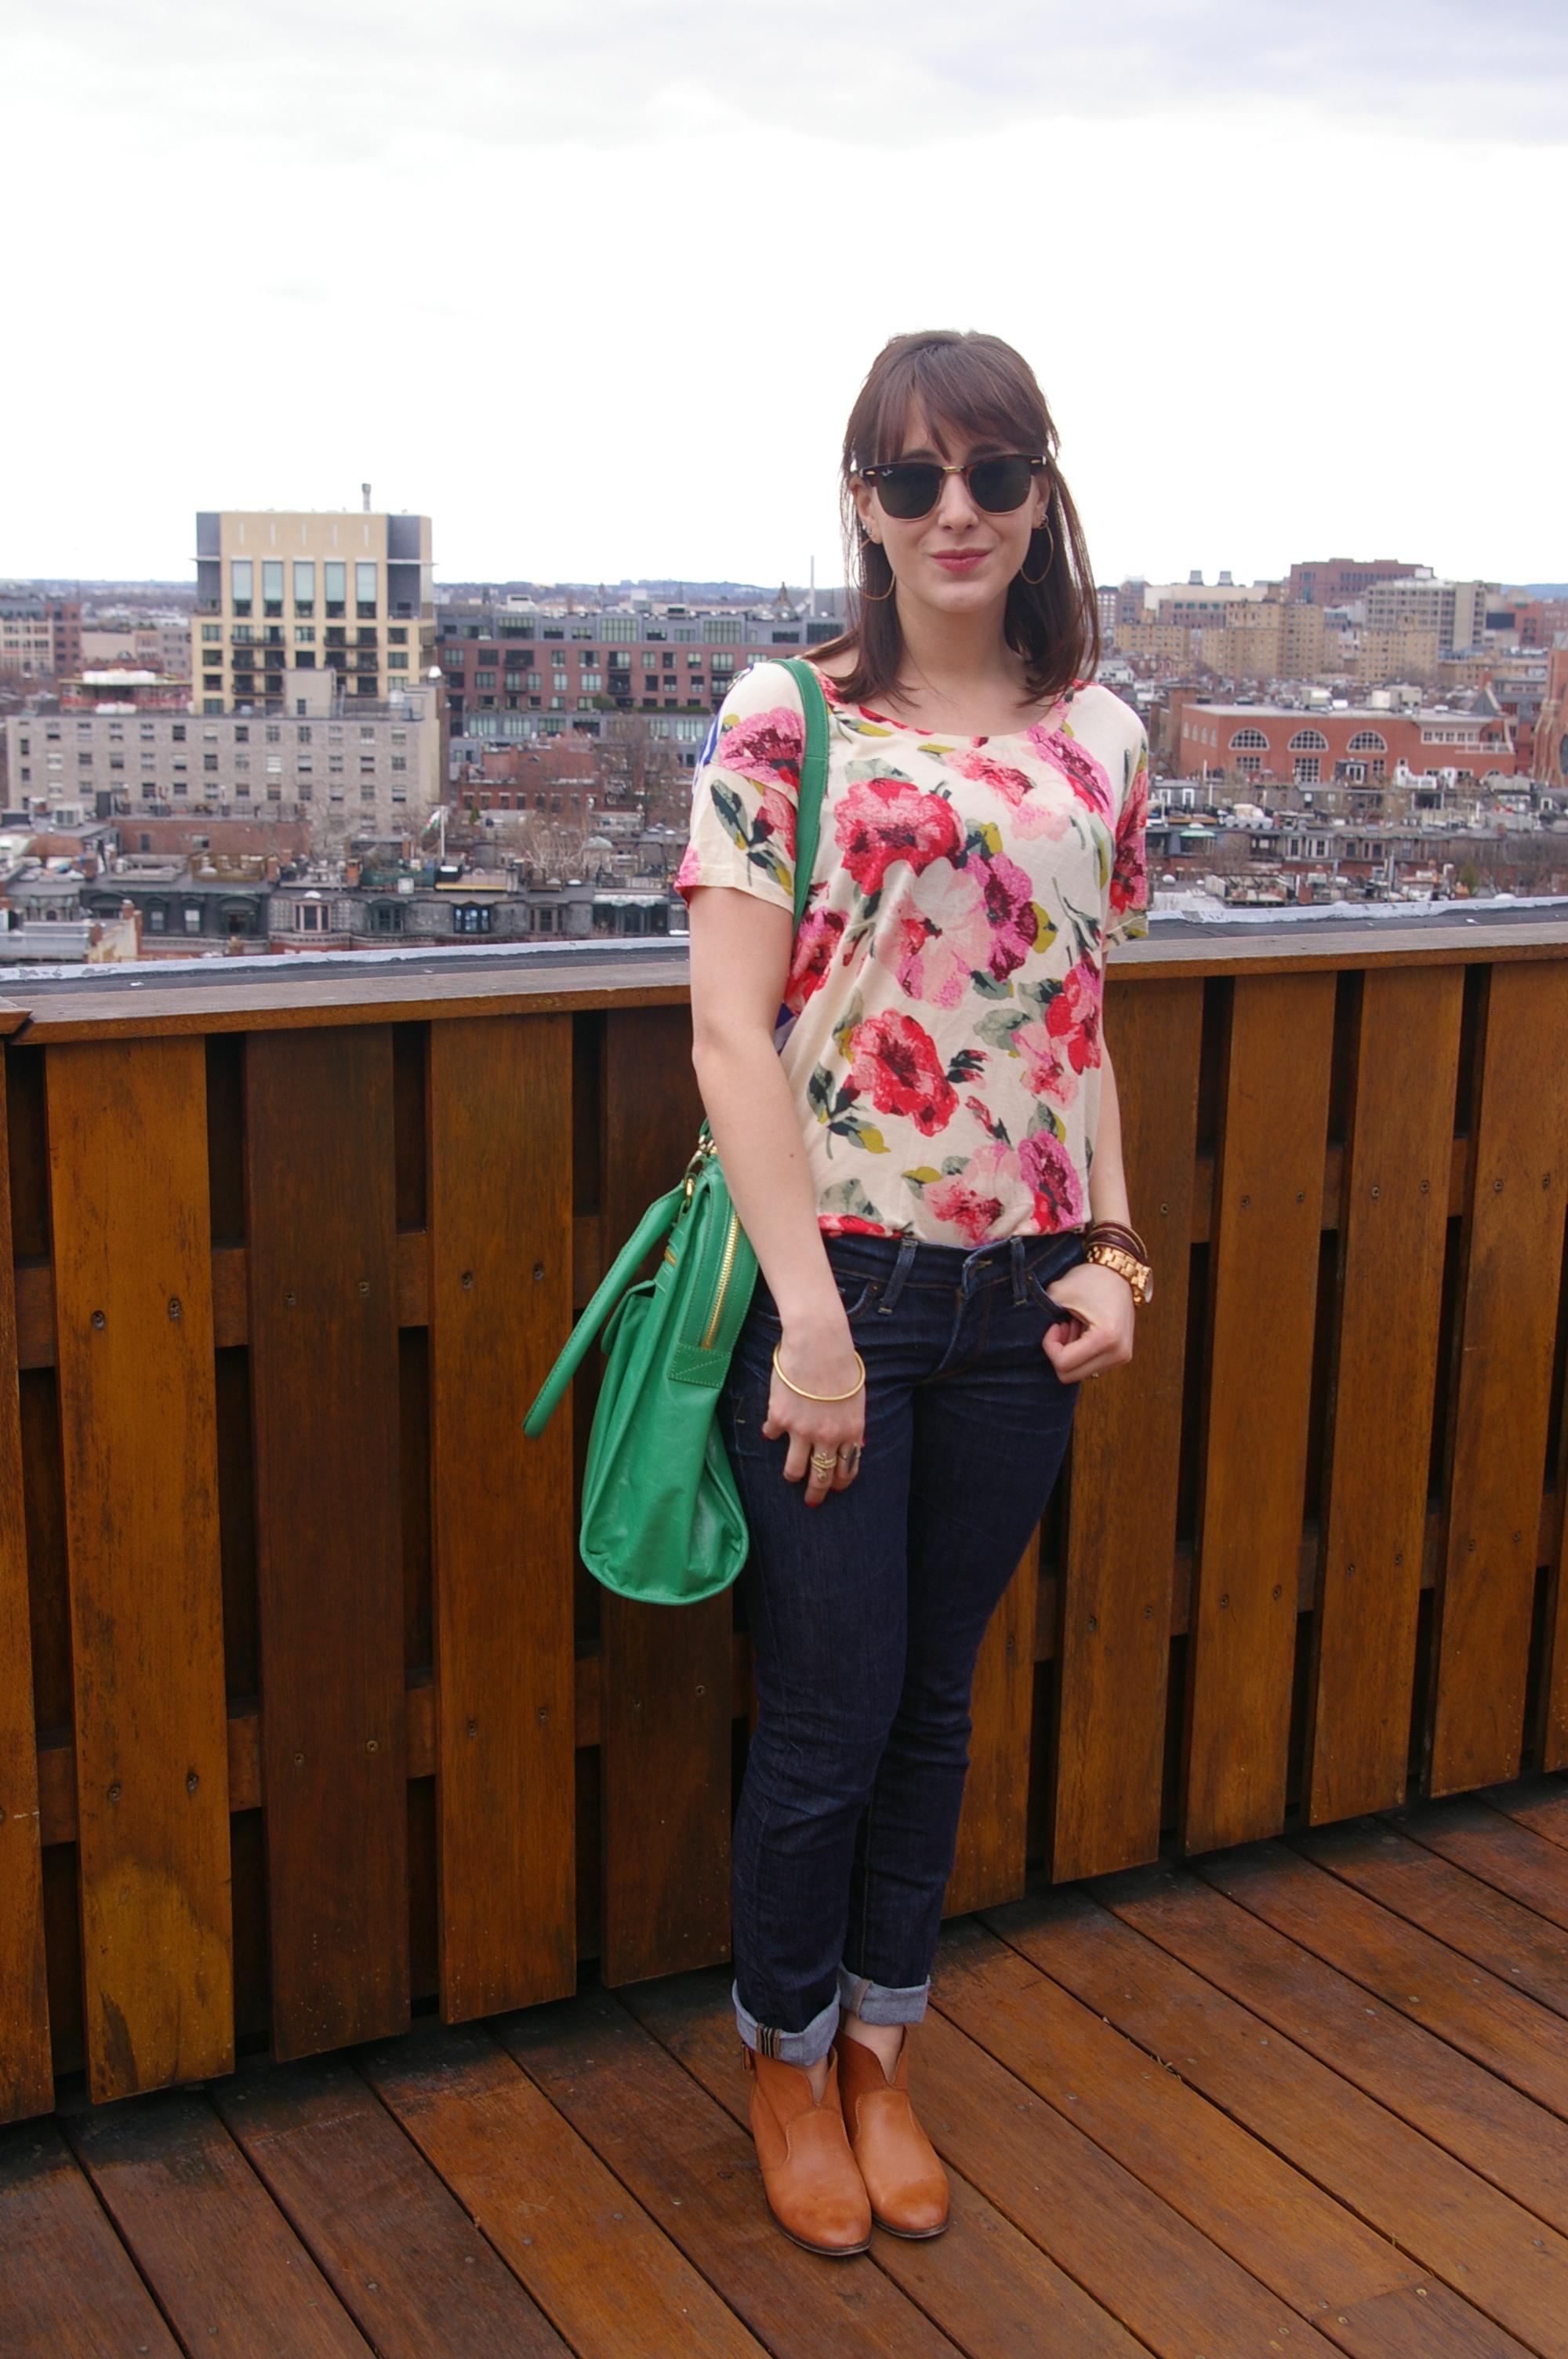 Badgey Mishka bag, Madewell tee, Lucky Brand jeans